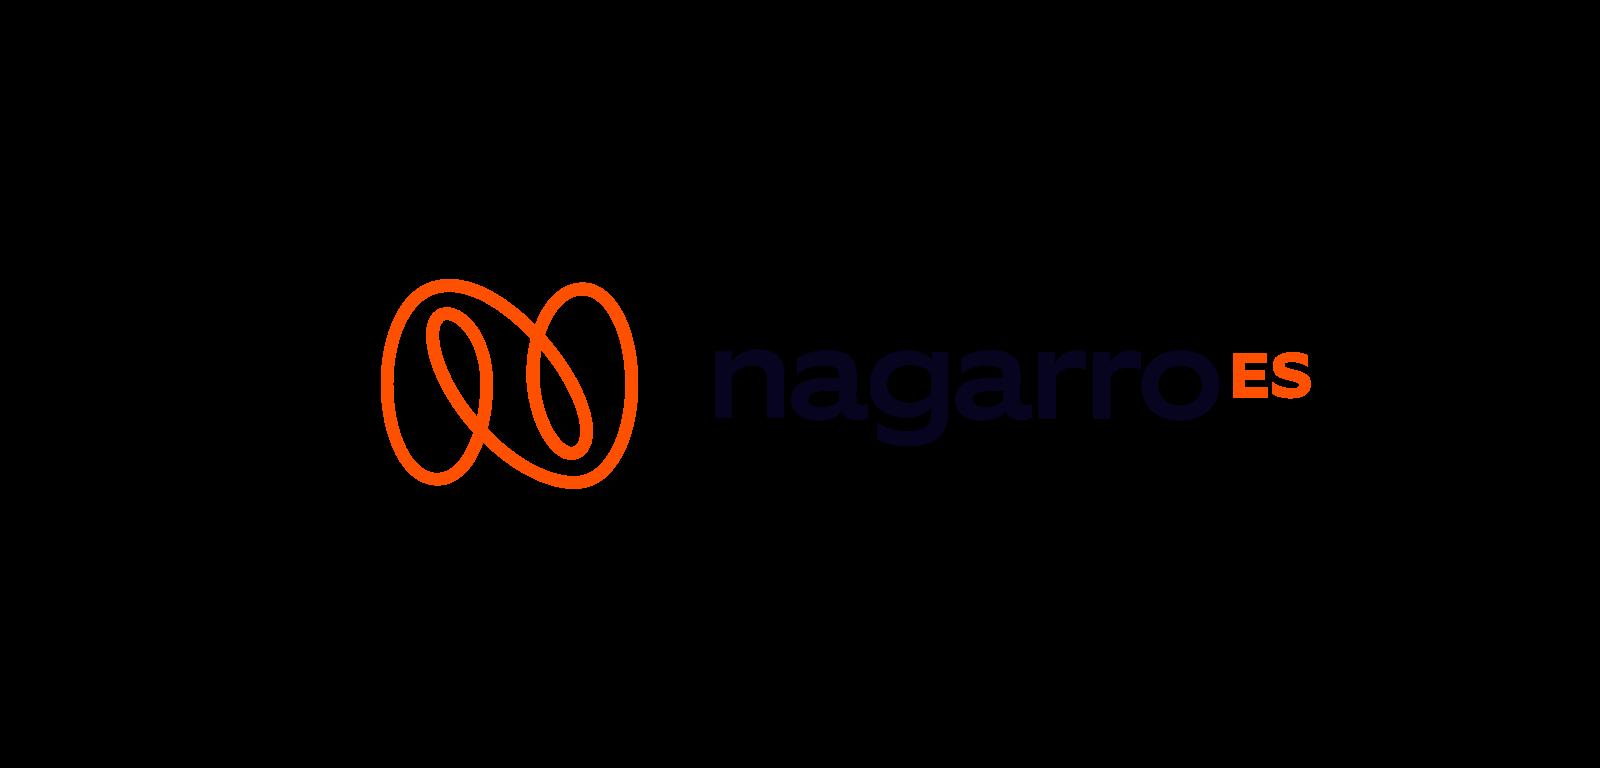 Nagarro ES